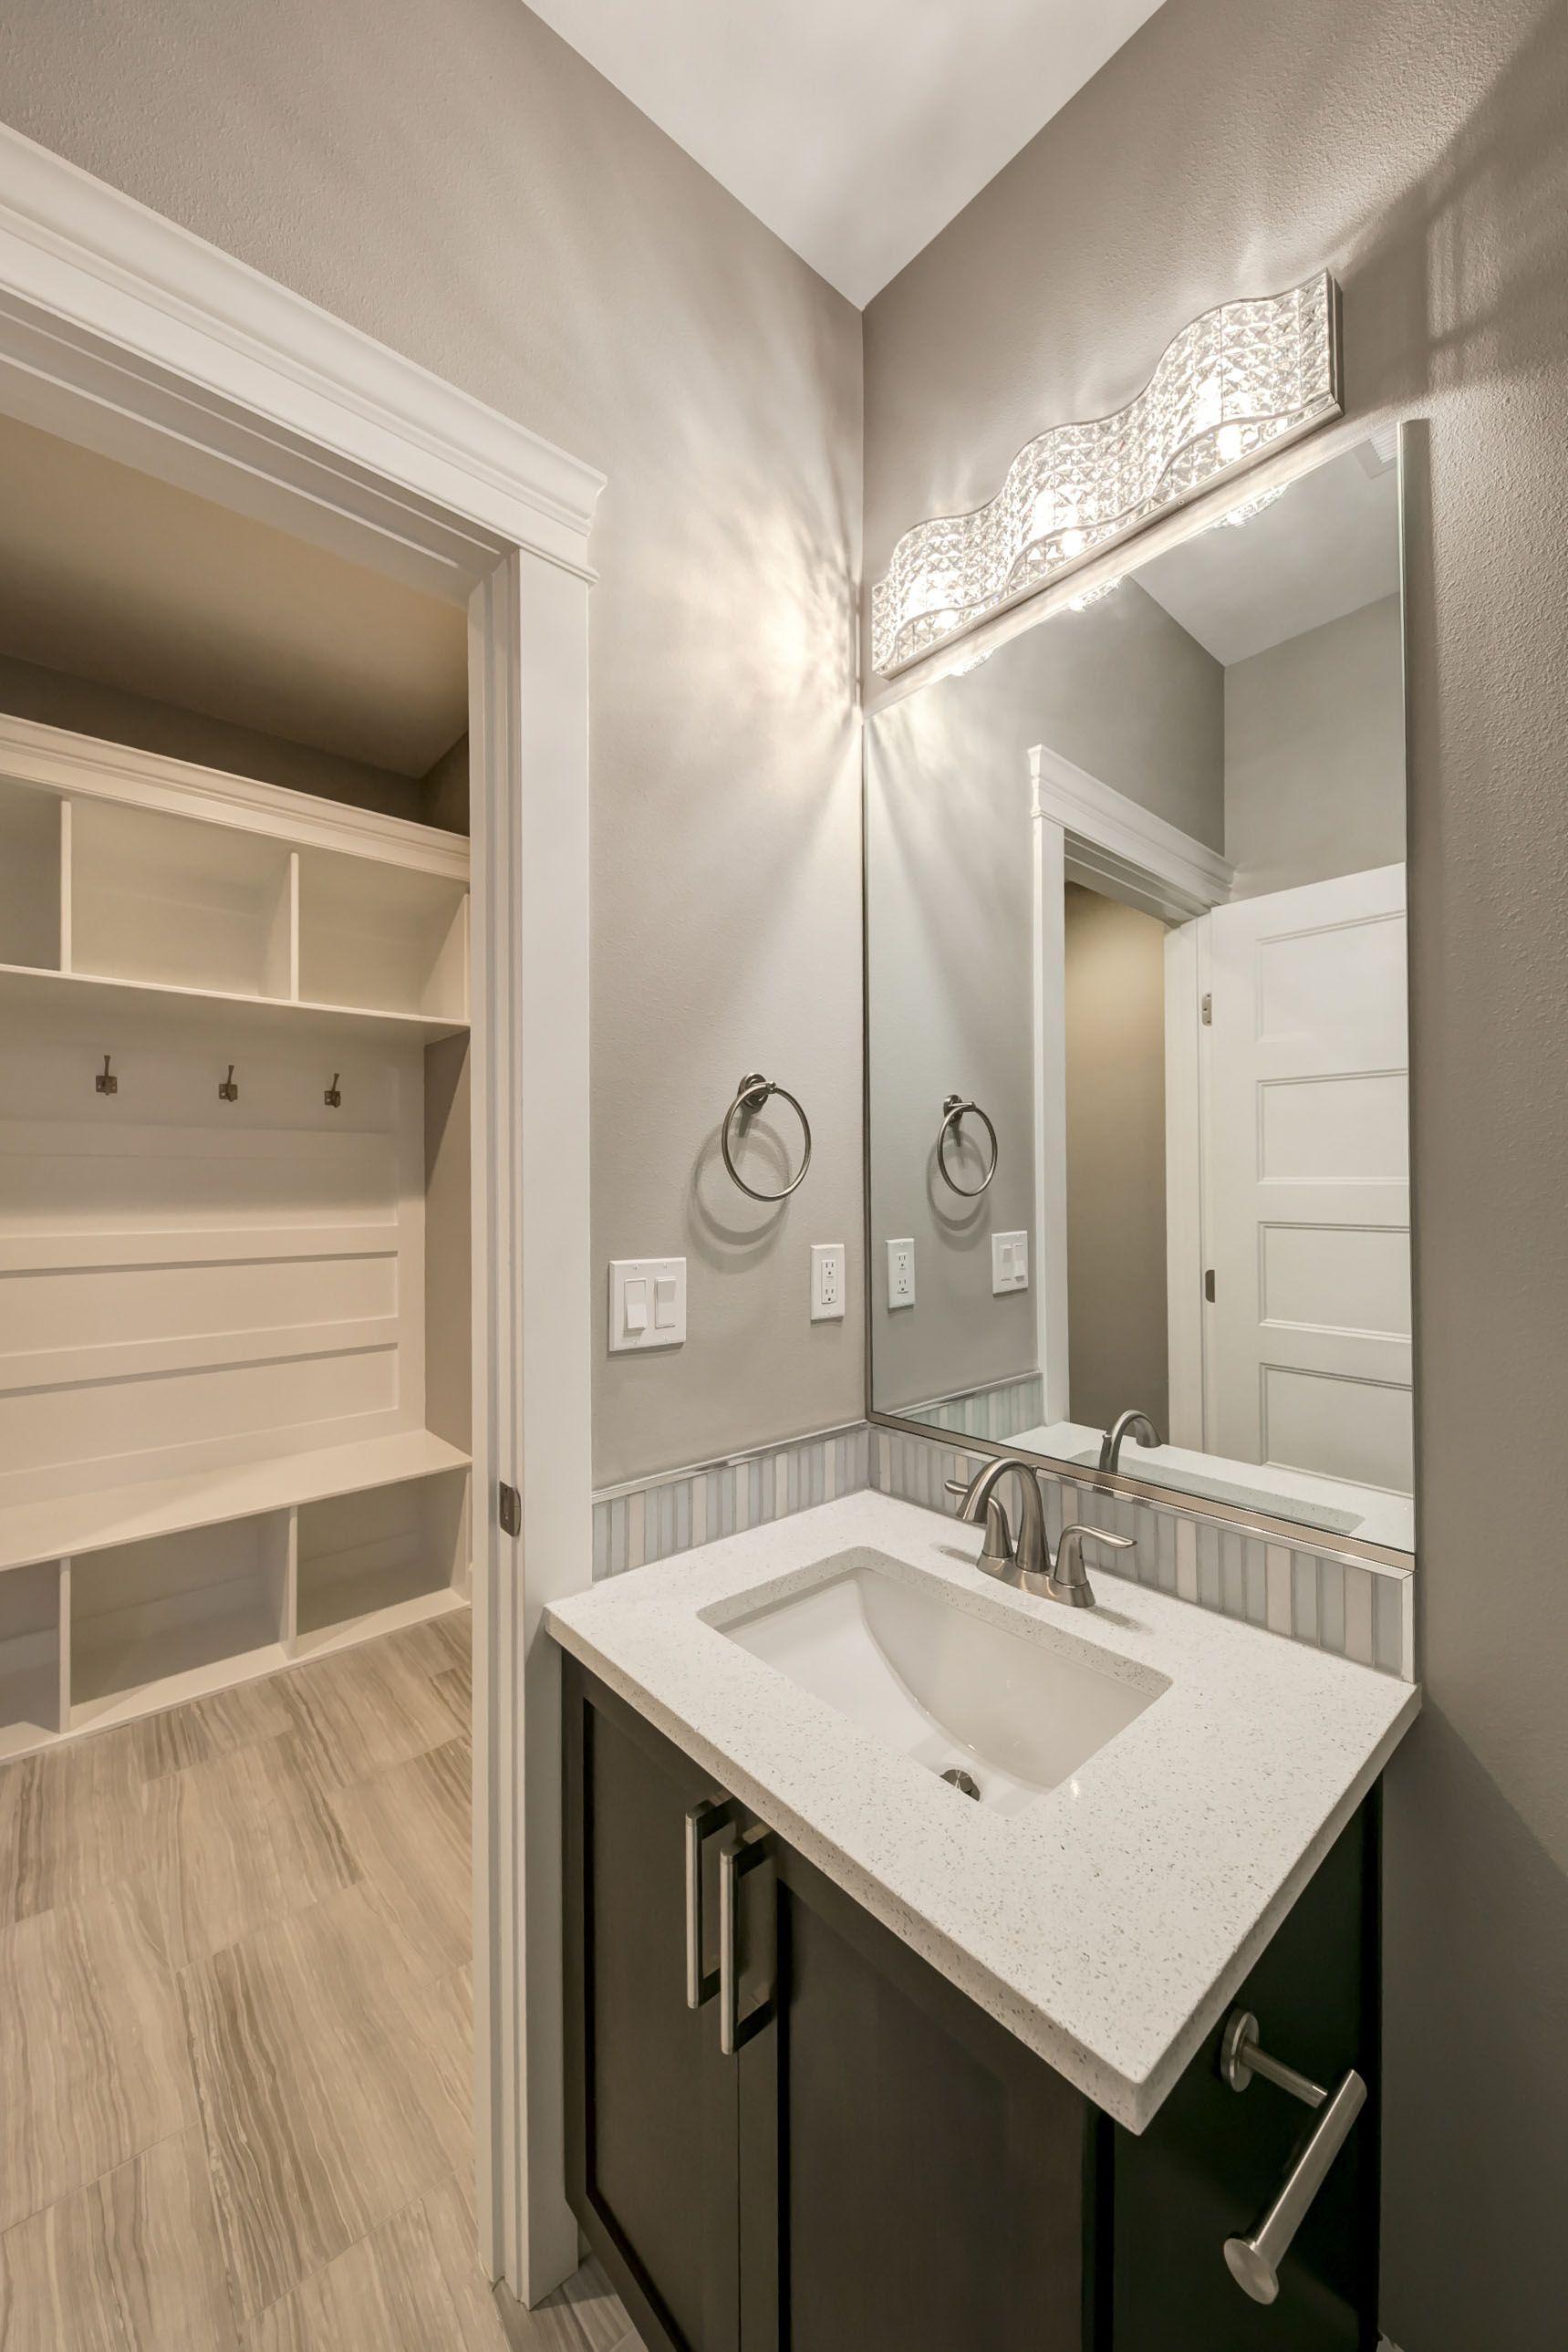 Cheap Elegant Bathroom Sink Faucet: Beethoven - Prodigy Homes Inc.